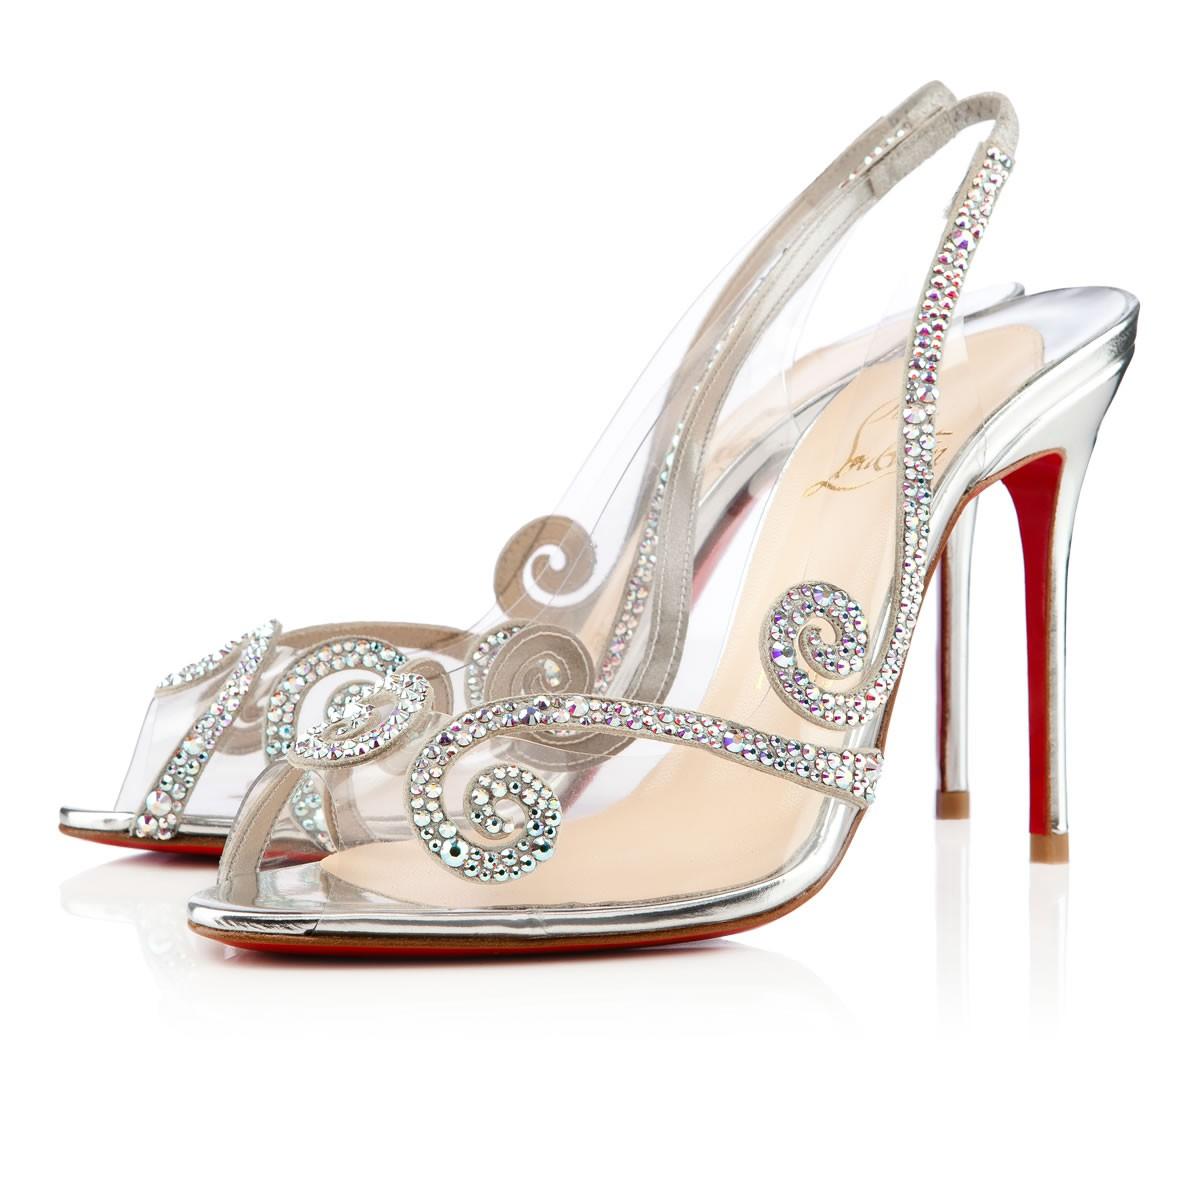 louboutin bridal shoes photo - 1